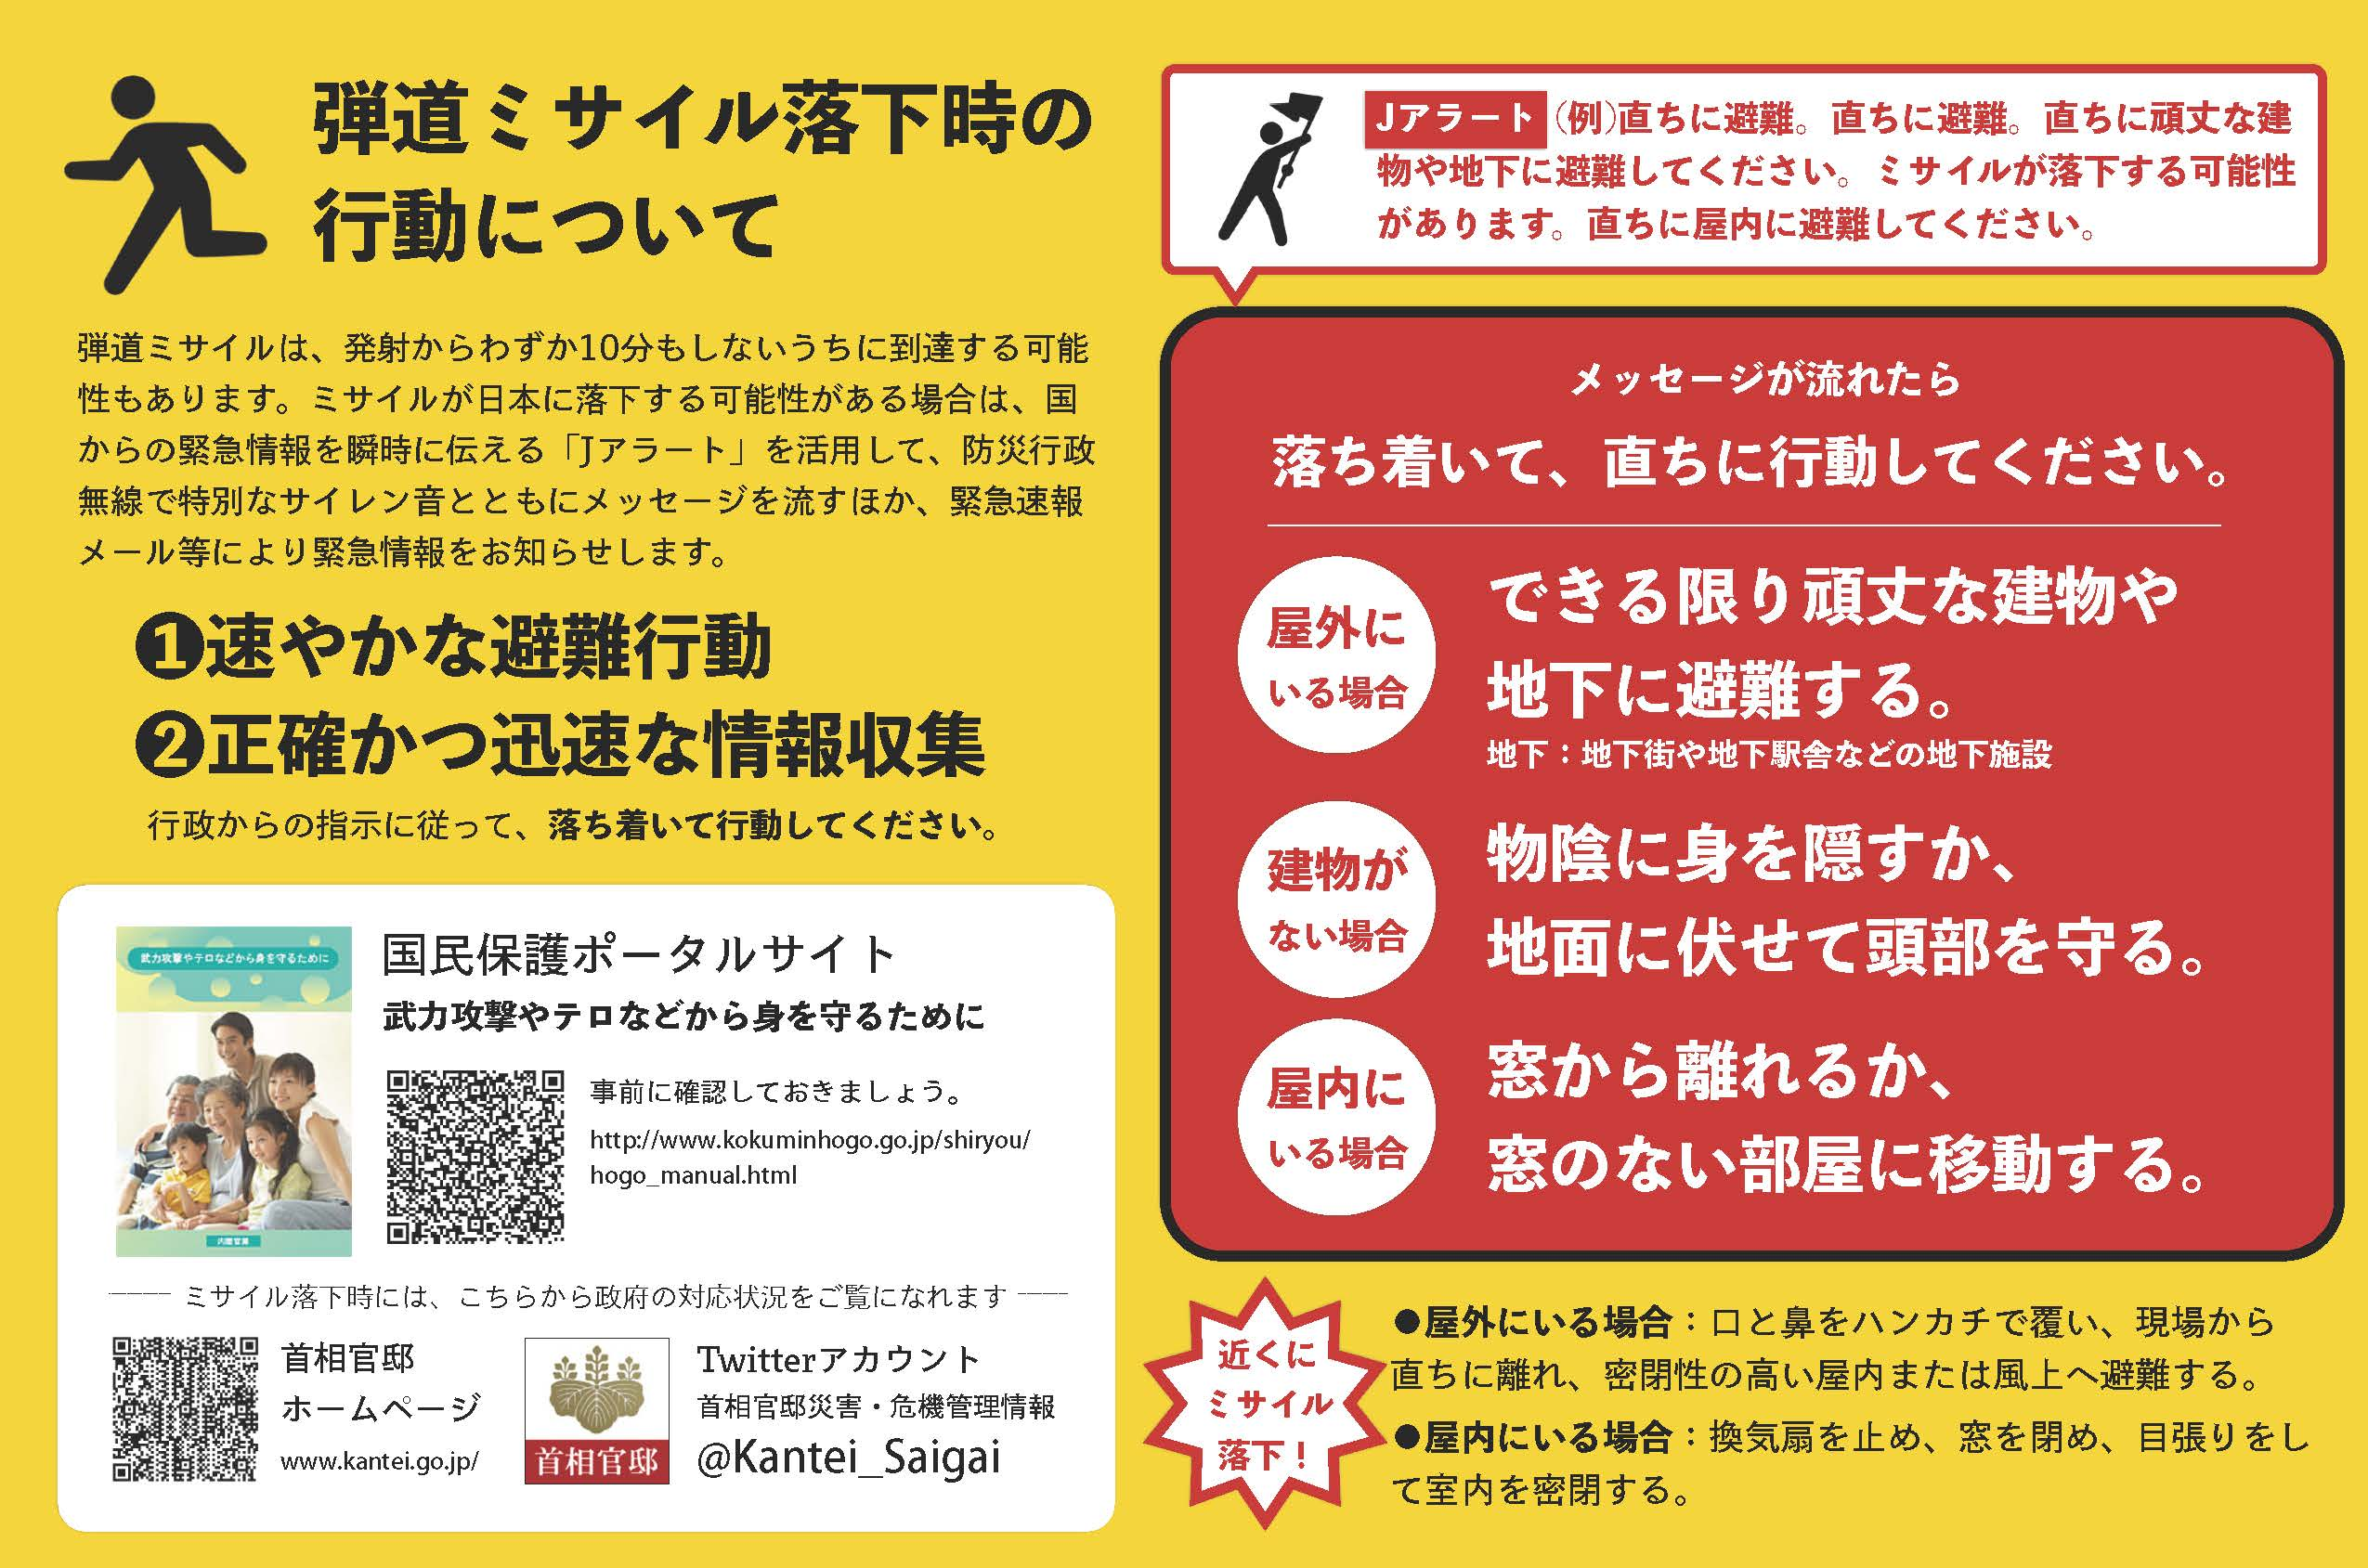 【Jアラート】日本政府「23日から北朝鮮のミサイル避難方法をCMで放映します」